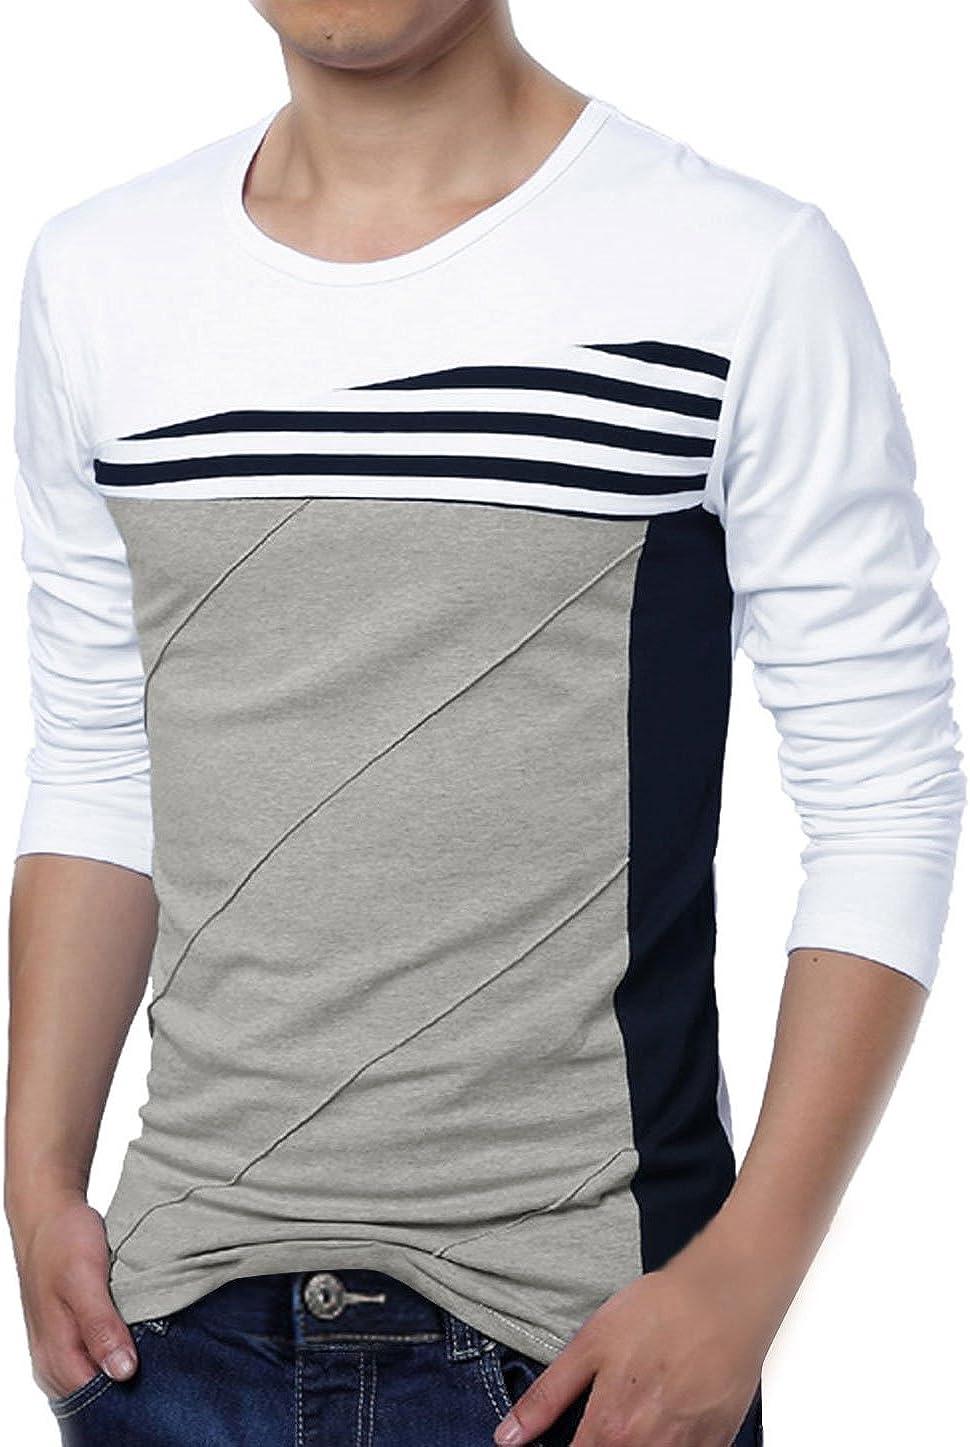 Allegra K Hombre Bloque Color Rayas camiseta